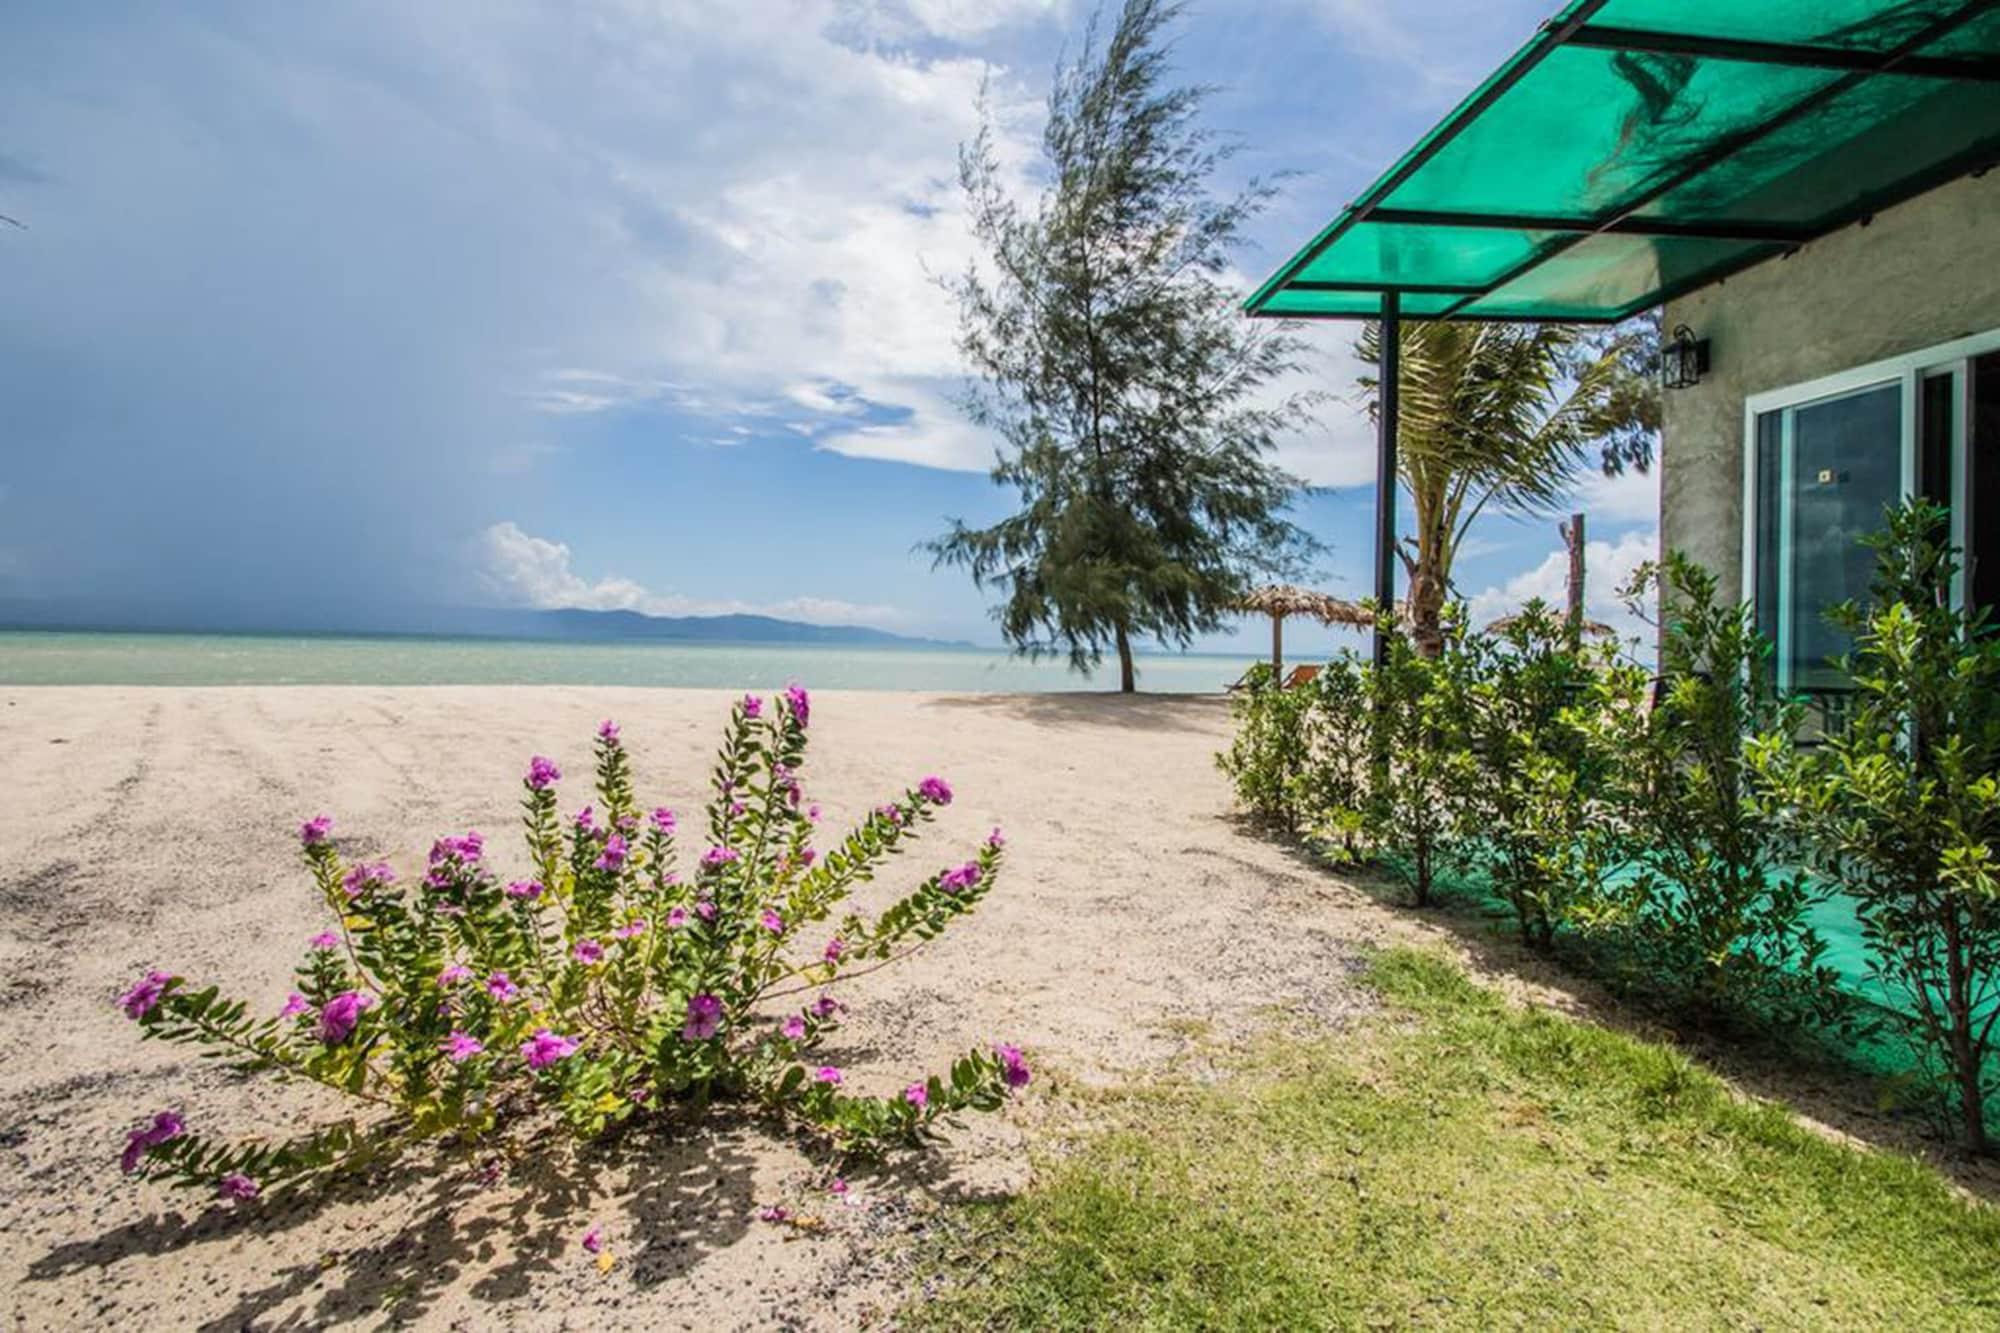 Seaesta Beach, Ko Phangan